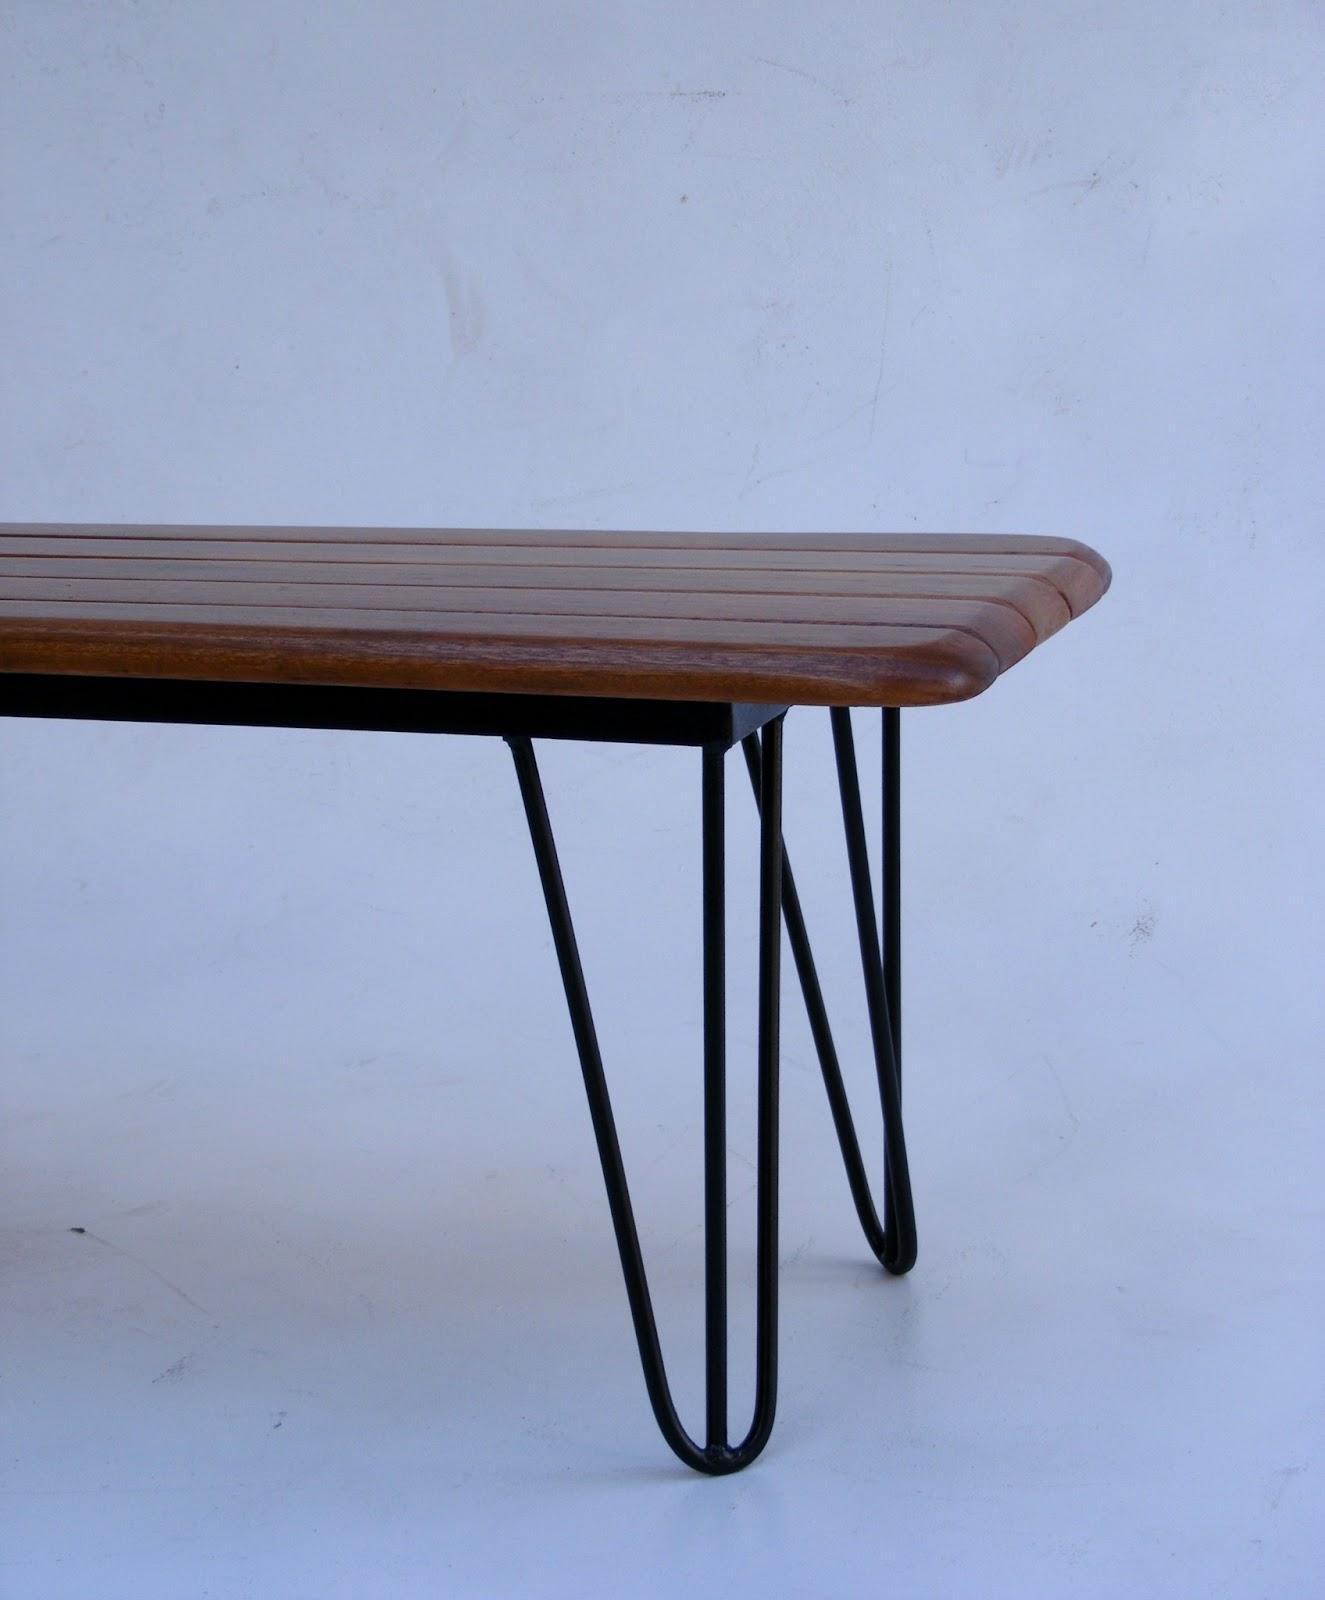 Wood Coffee Table Metal Legs: VAMP FURNITURE: New Vintage Furniture Stock At Vamp